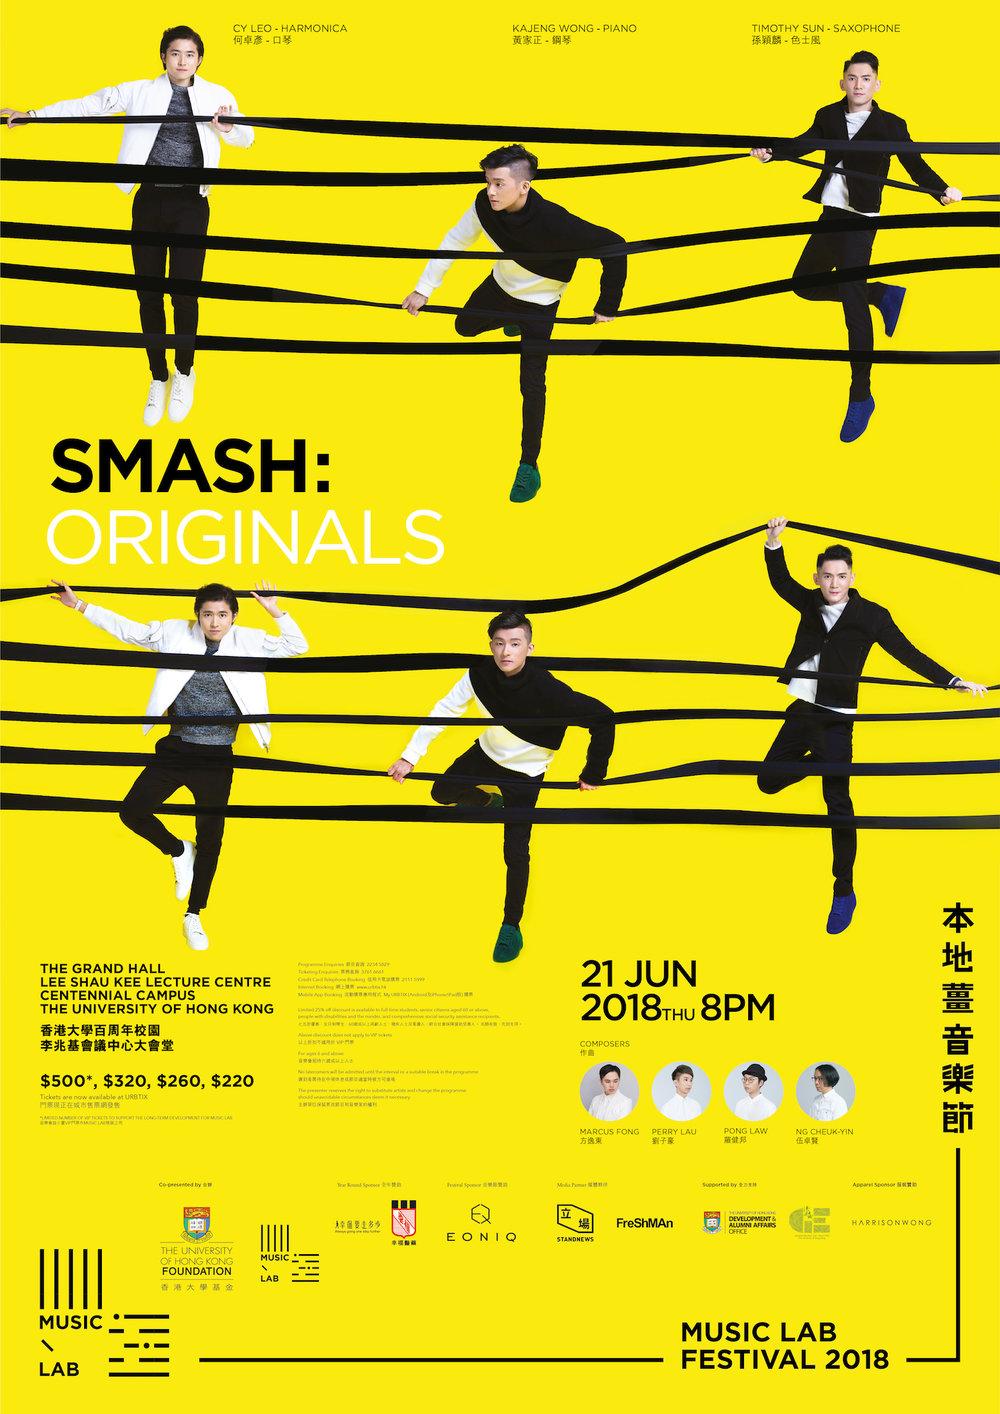 Smash: Originals - 樂種:原創音樂日期:2018 年 6 月 21 日 | 下午 8 時地點:香港大學百周年校園李兆基會議中心大會堂組合:SMASH (何卓彦,孫穎麟,黃家正)繼上年度廣獲好評,樂迷引頸以待的SMASH 今年再下一城,與香港大學及多名本地作曲家合作,帶來變幻莫測的原創聲音。動人出眾的色士風手孫穎麟、活力四射的口琴手何卓彥、技巧多變的鋼琴家黃家正聯手演奏,與樂迷一起盡情地Smash 一場,感受充滿激情和火熱的音樂會!